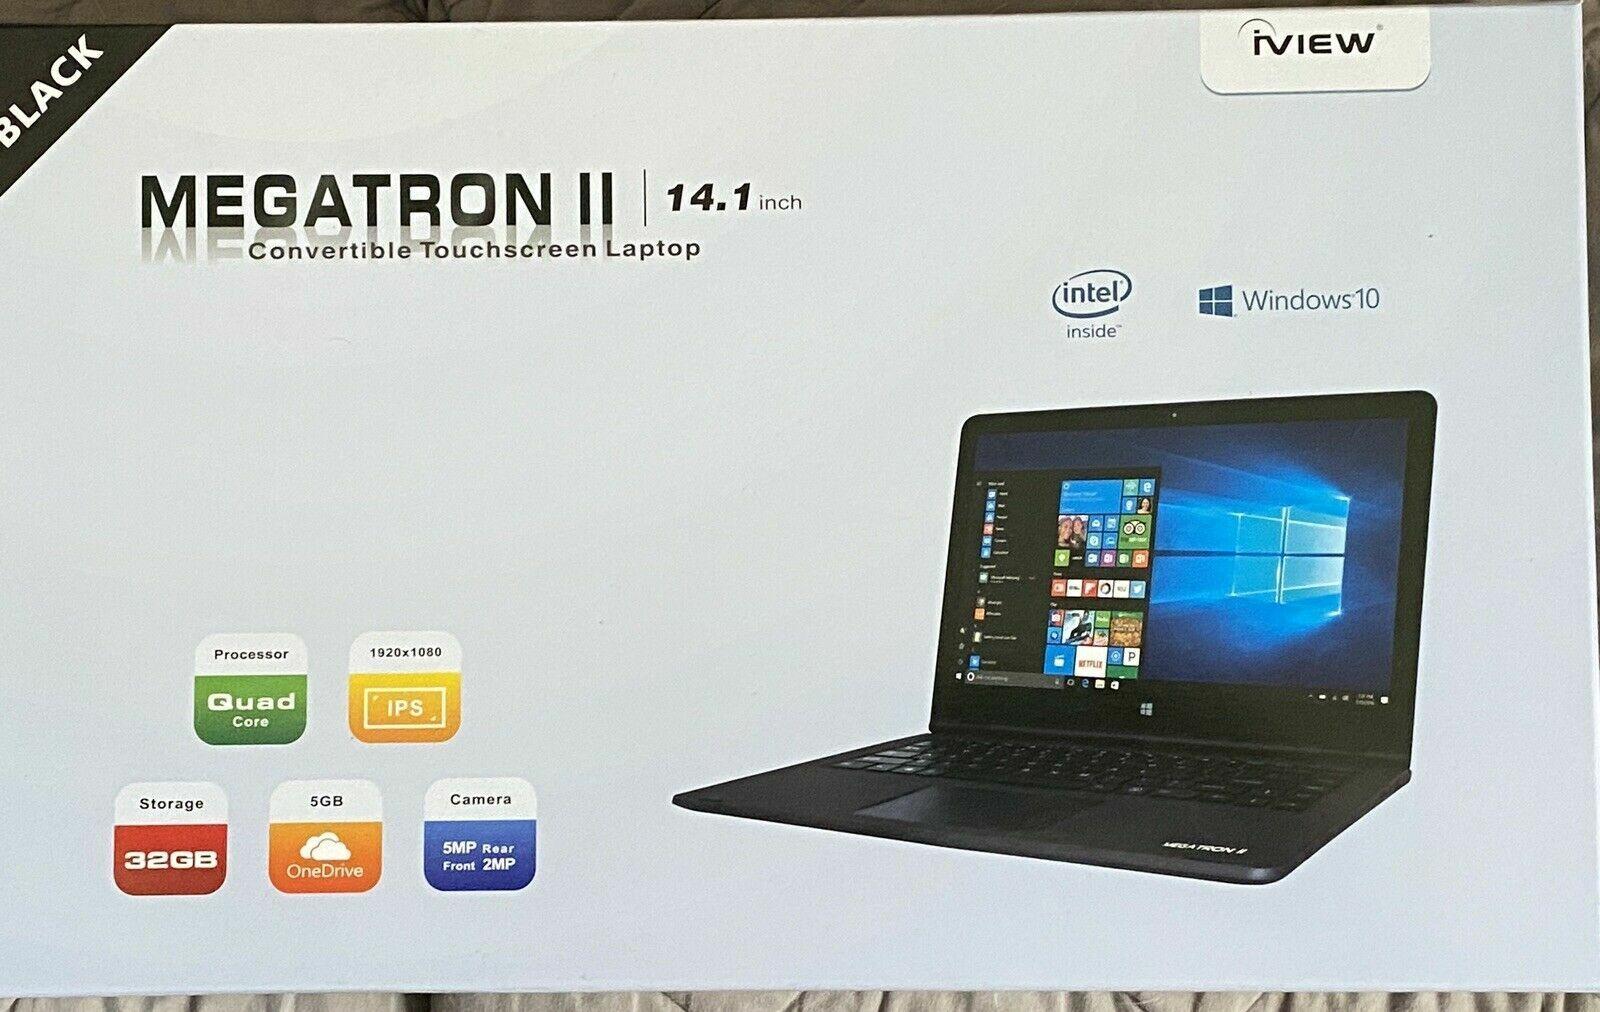 "Laptop Windows - iView MEGATRON II -14.1"" Convertible Touchscreen Laptop 32gb storage  Windows 10"